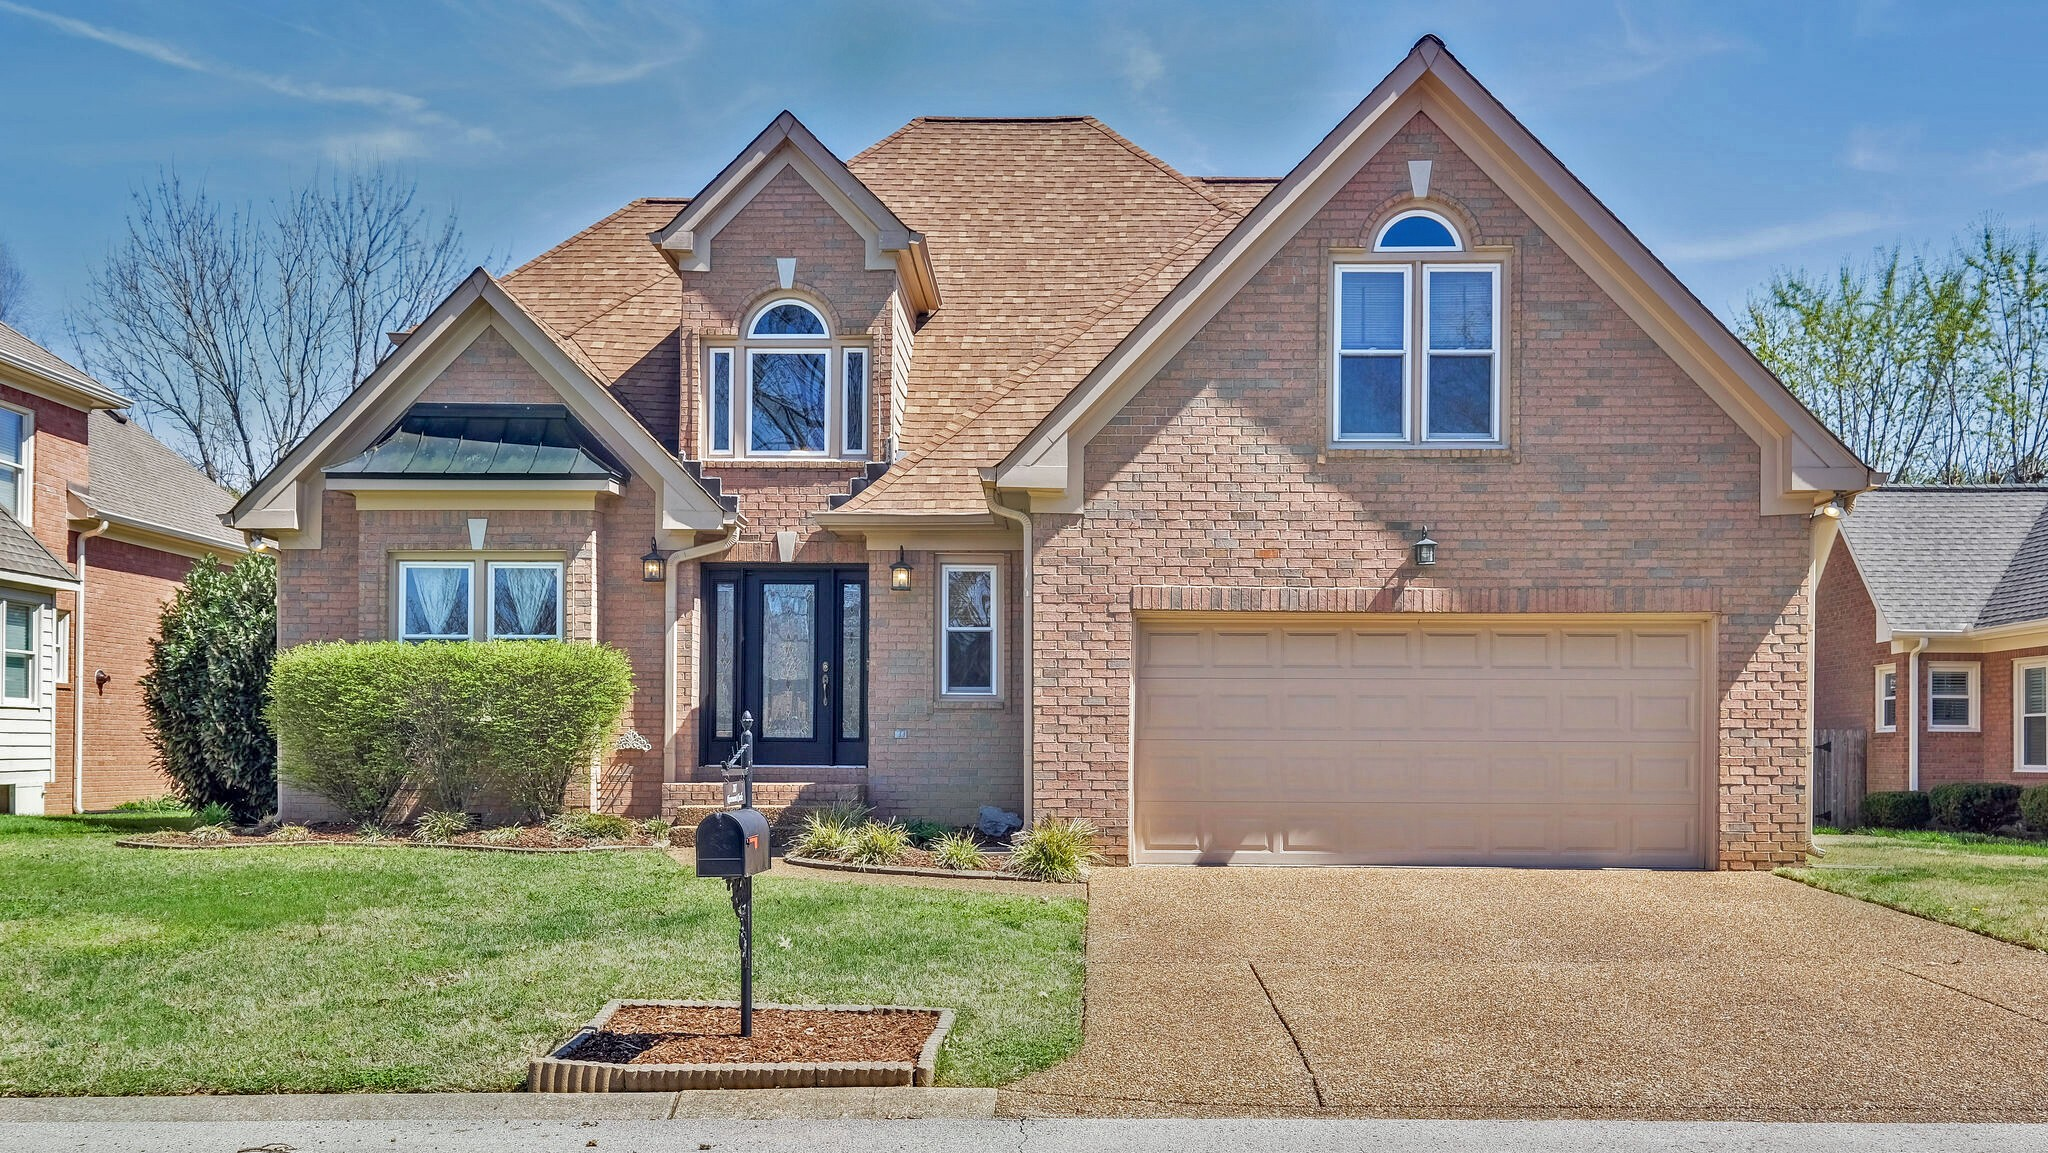 287 Rivermont Cir Property Photo - Franklin, TN real estate listing